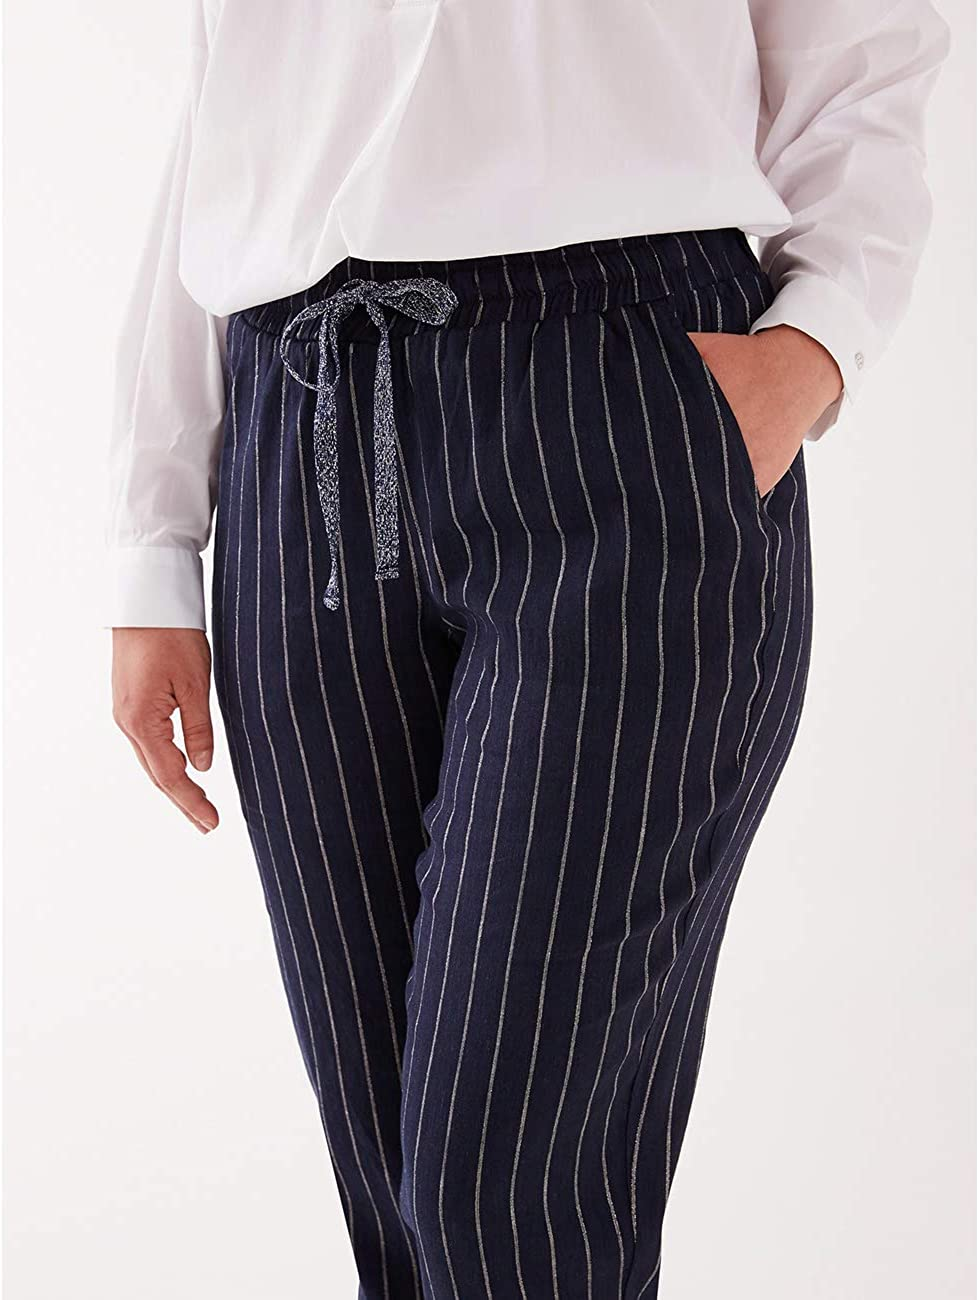 Pantaloni Joggers gessati Italian Plus Size Fiorella Rubino